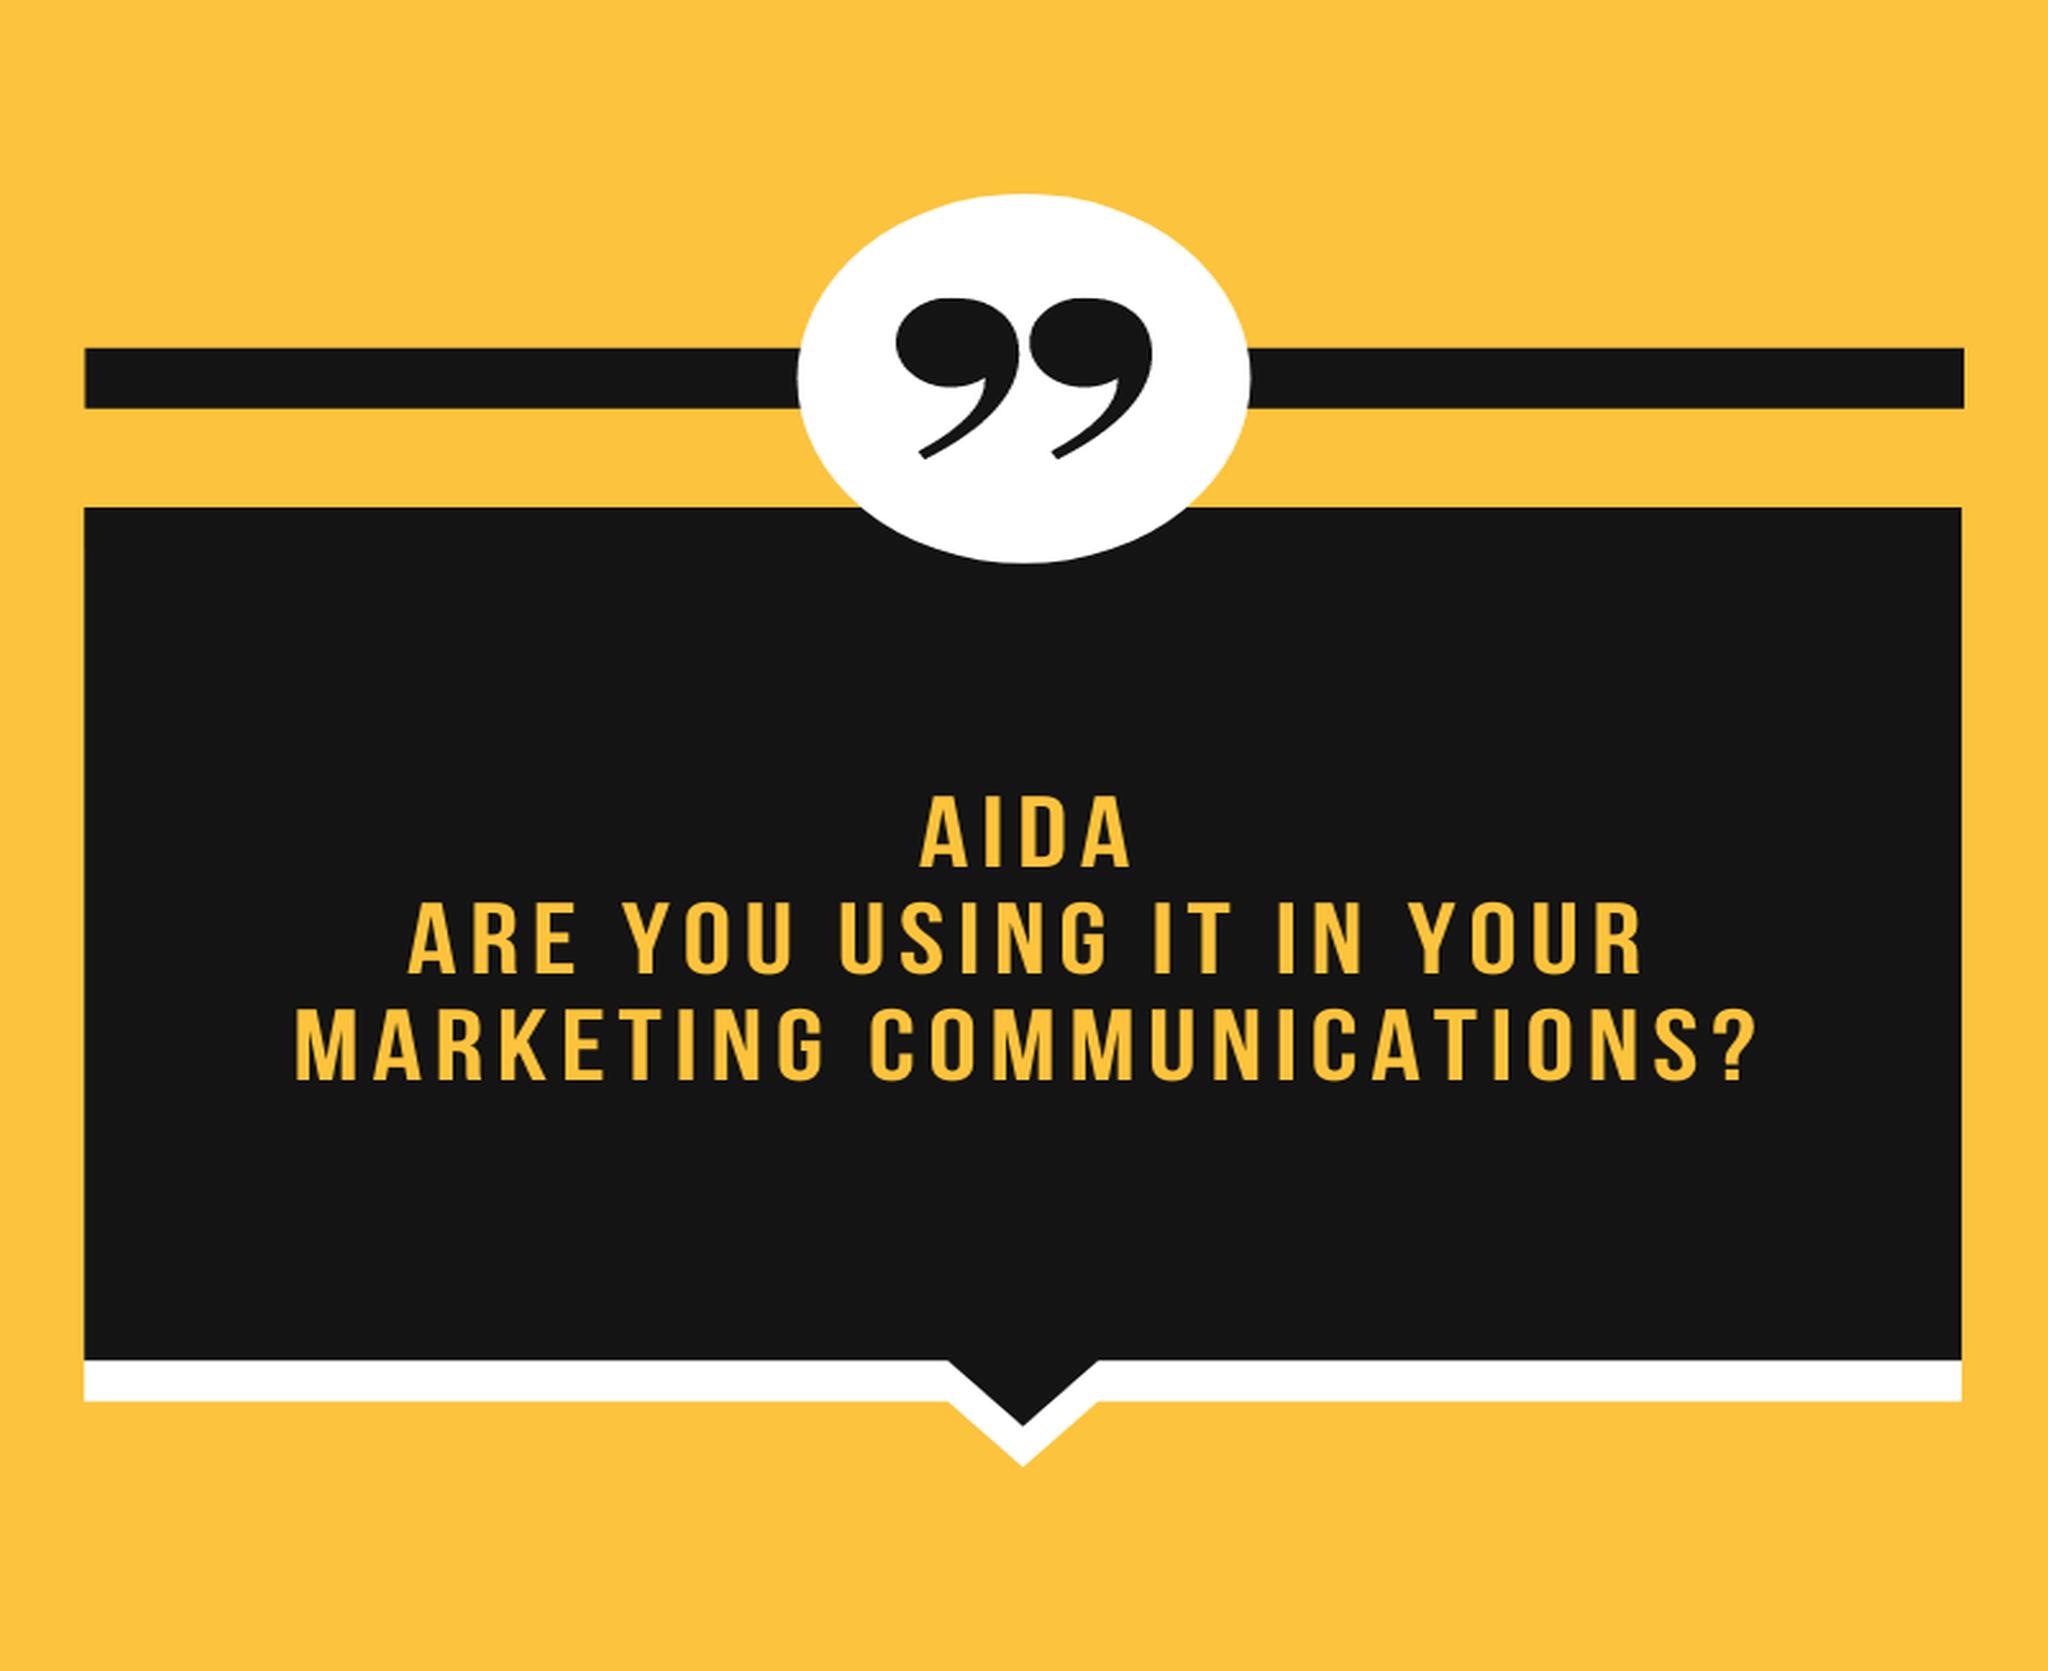 Why You Need AIDA